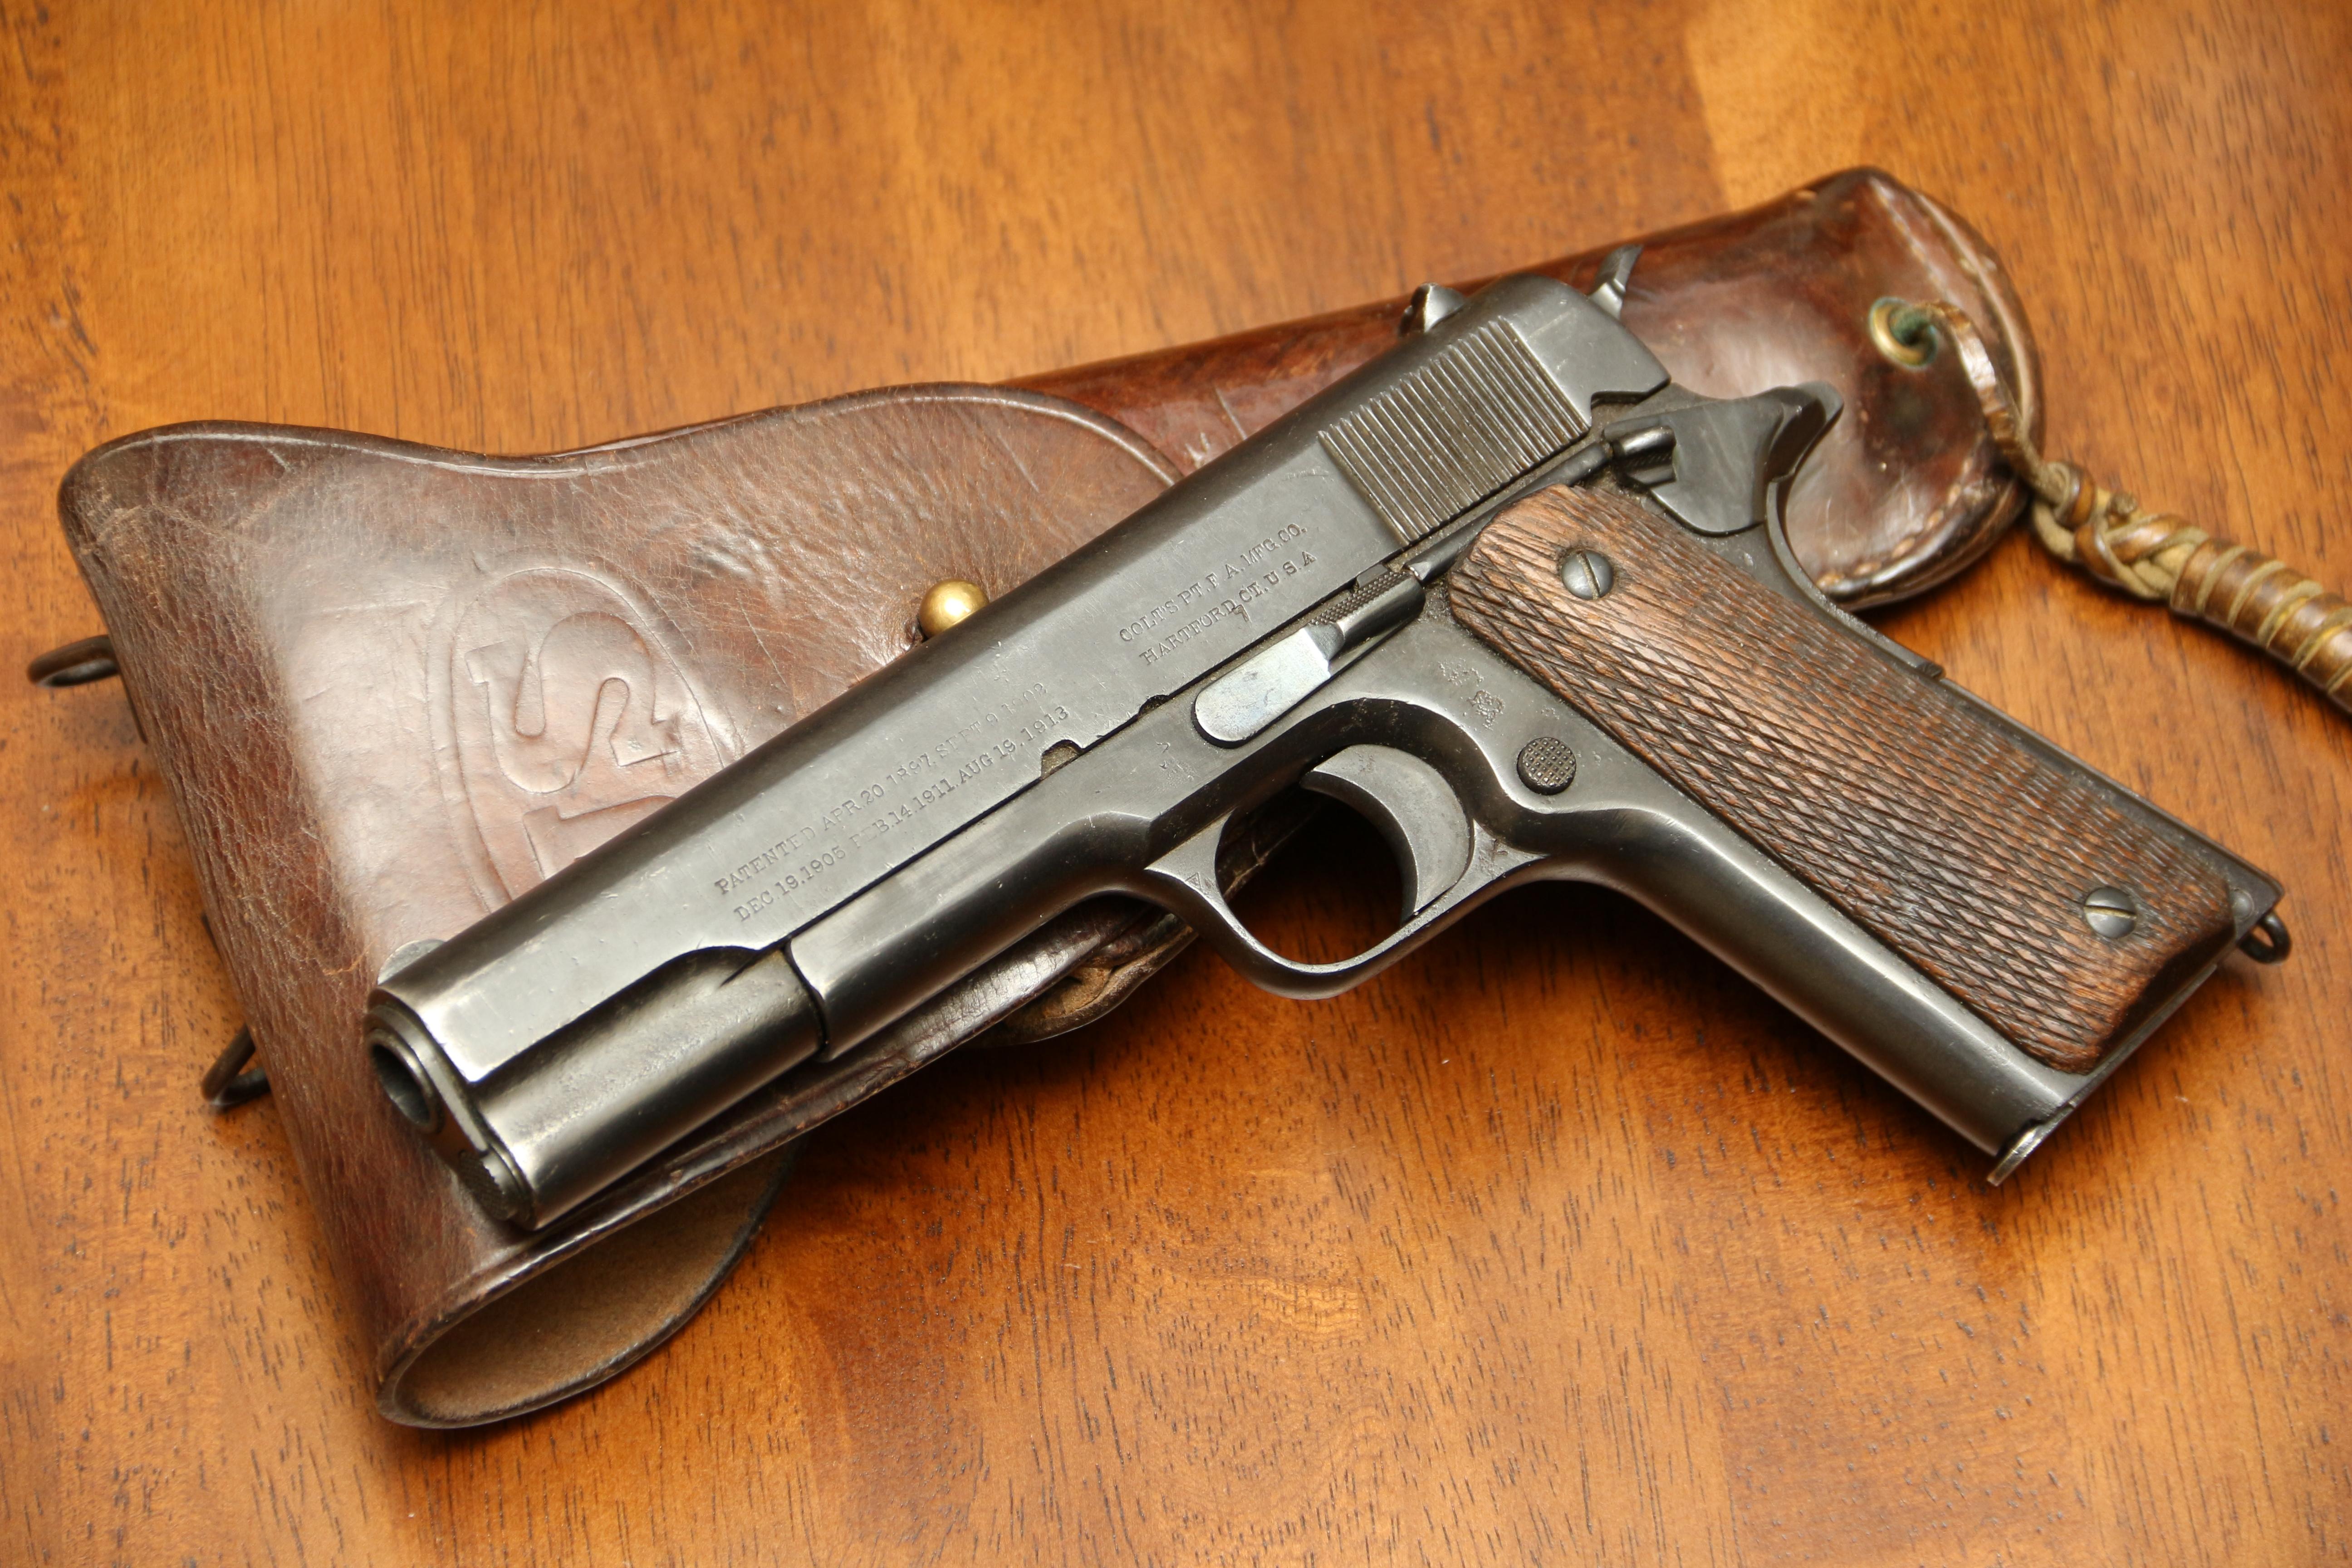 Фото Colt 1911, №79289, русский заказ царского периода